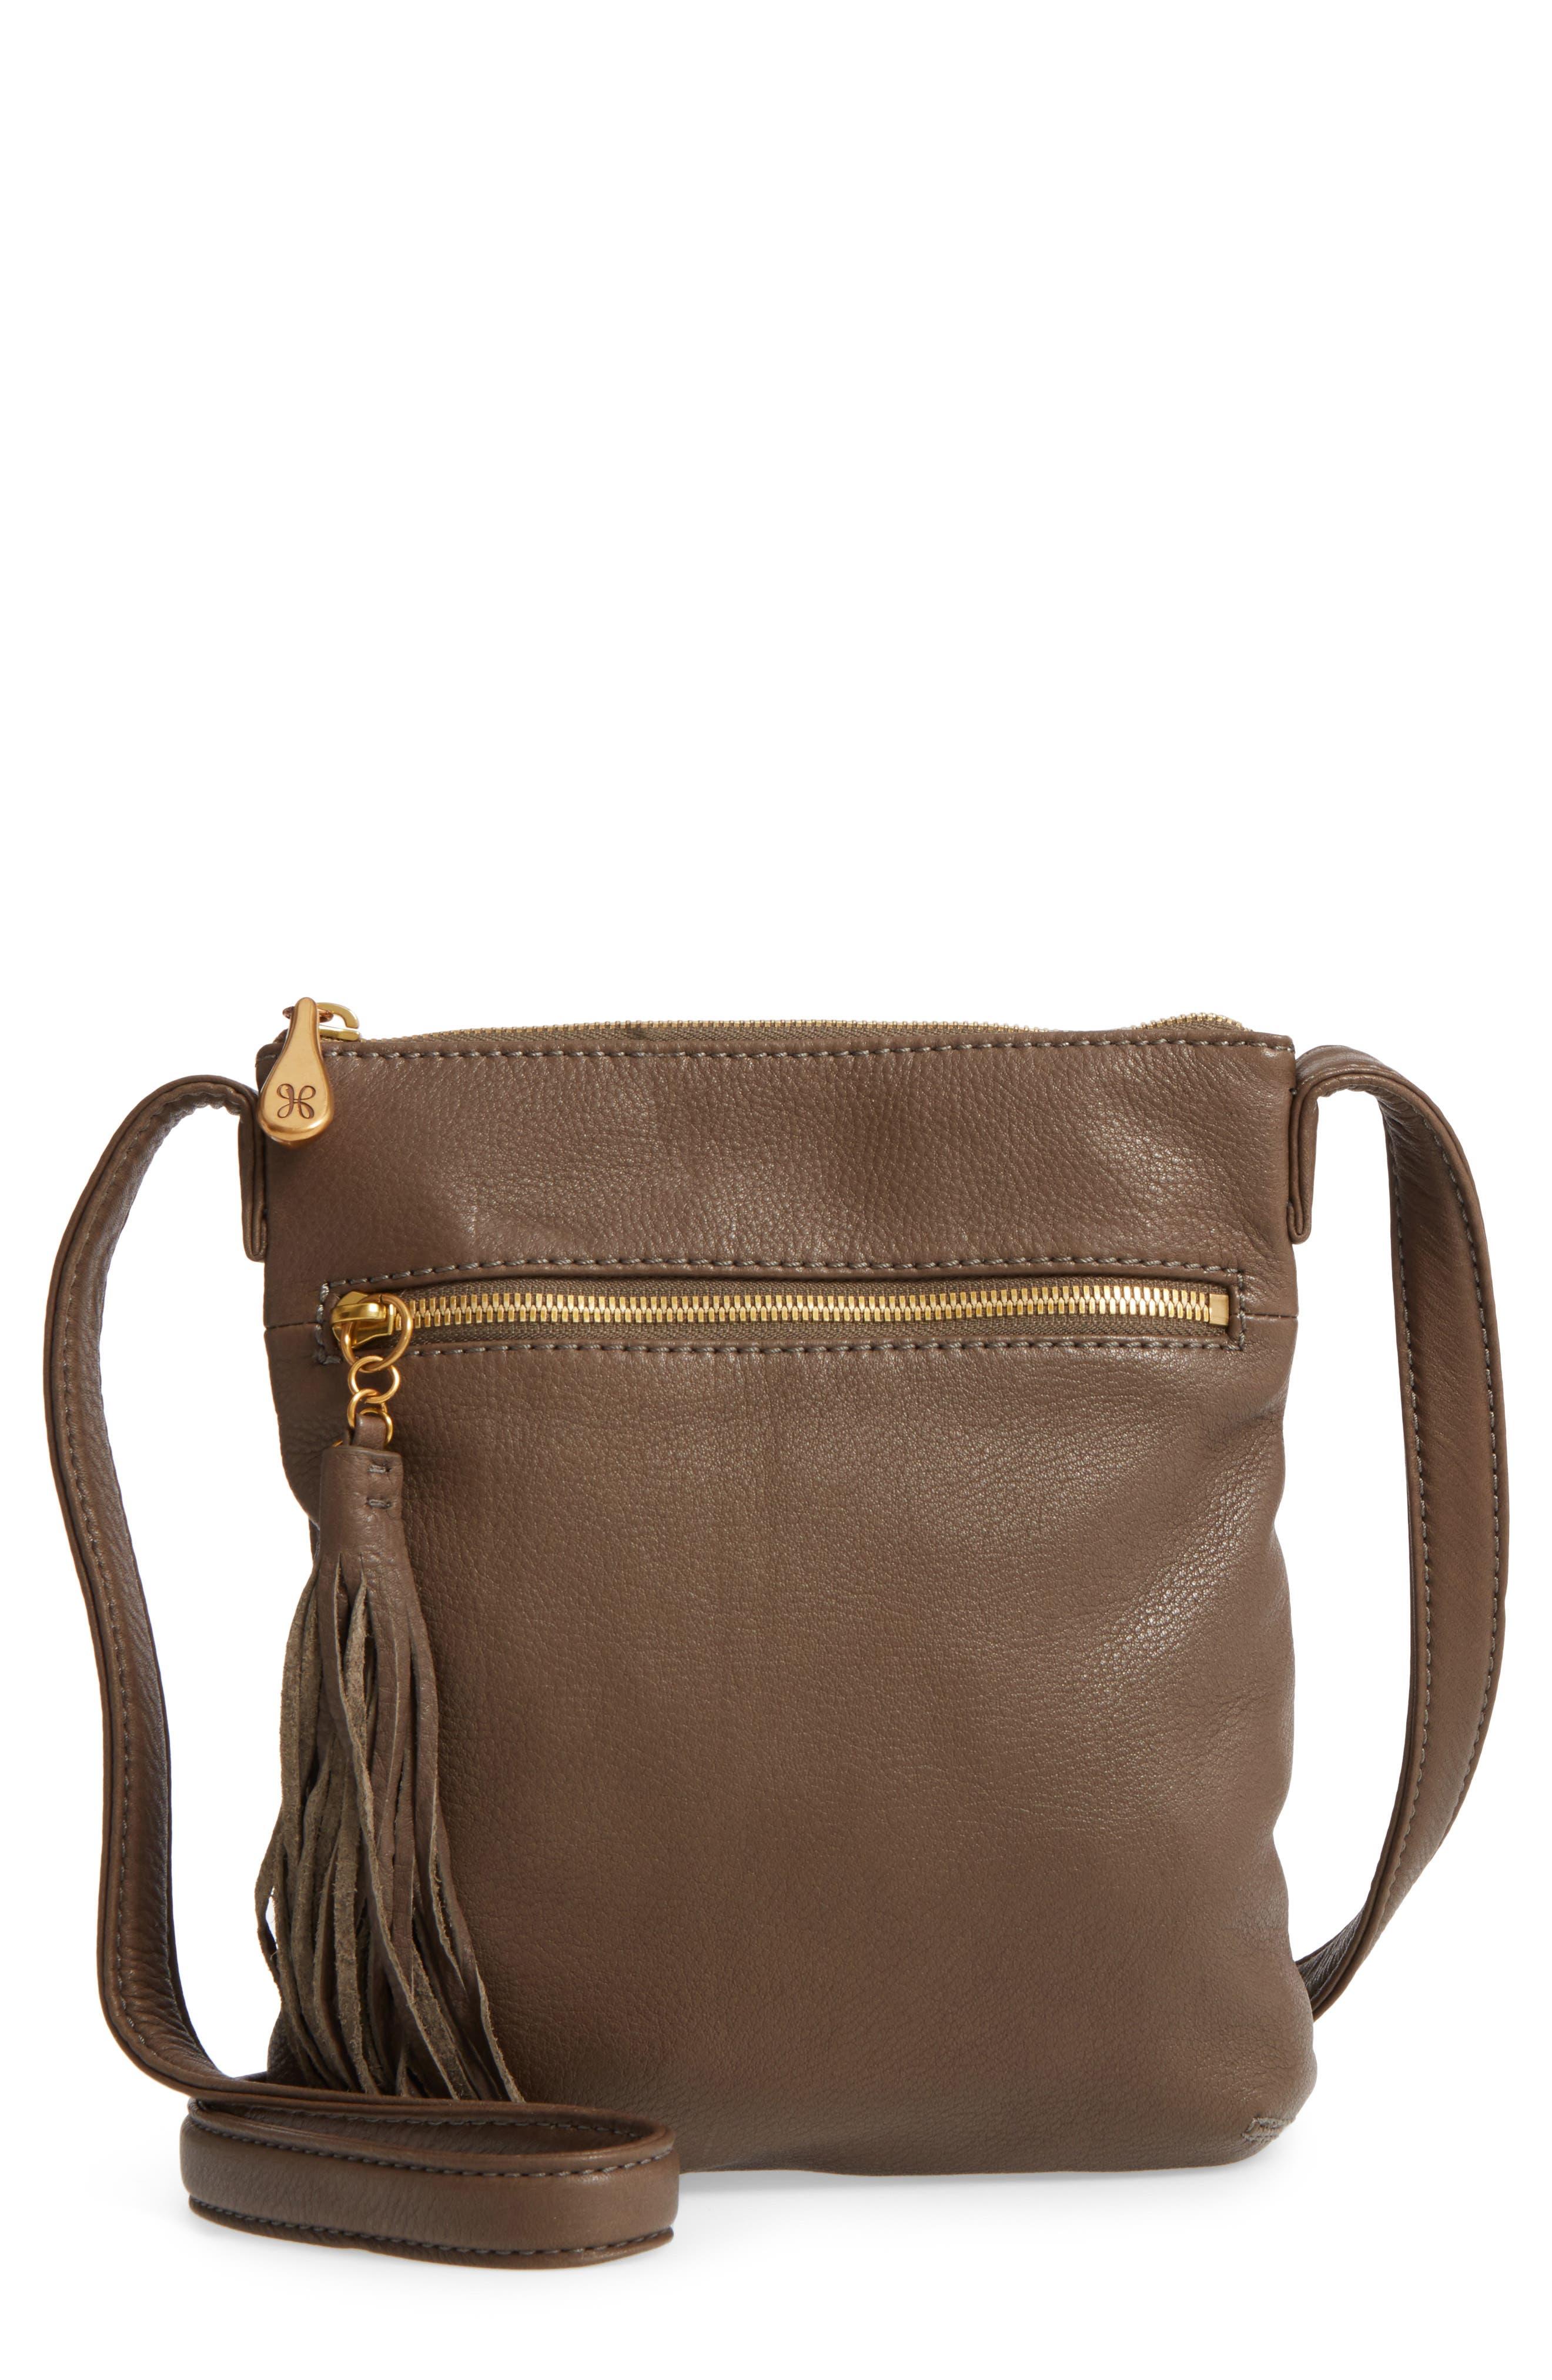 'Sarah' Leather Crossbody Bag,                             Main thumbnail 6, color,